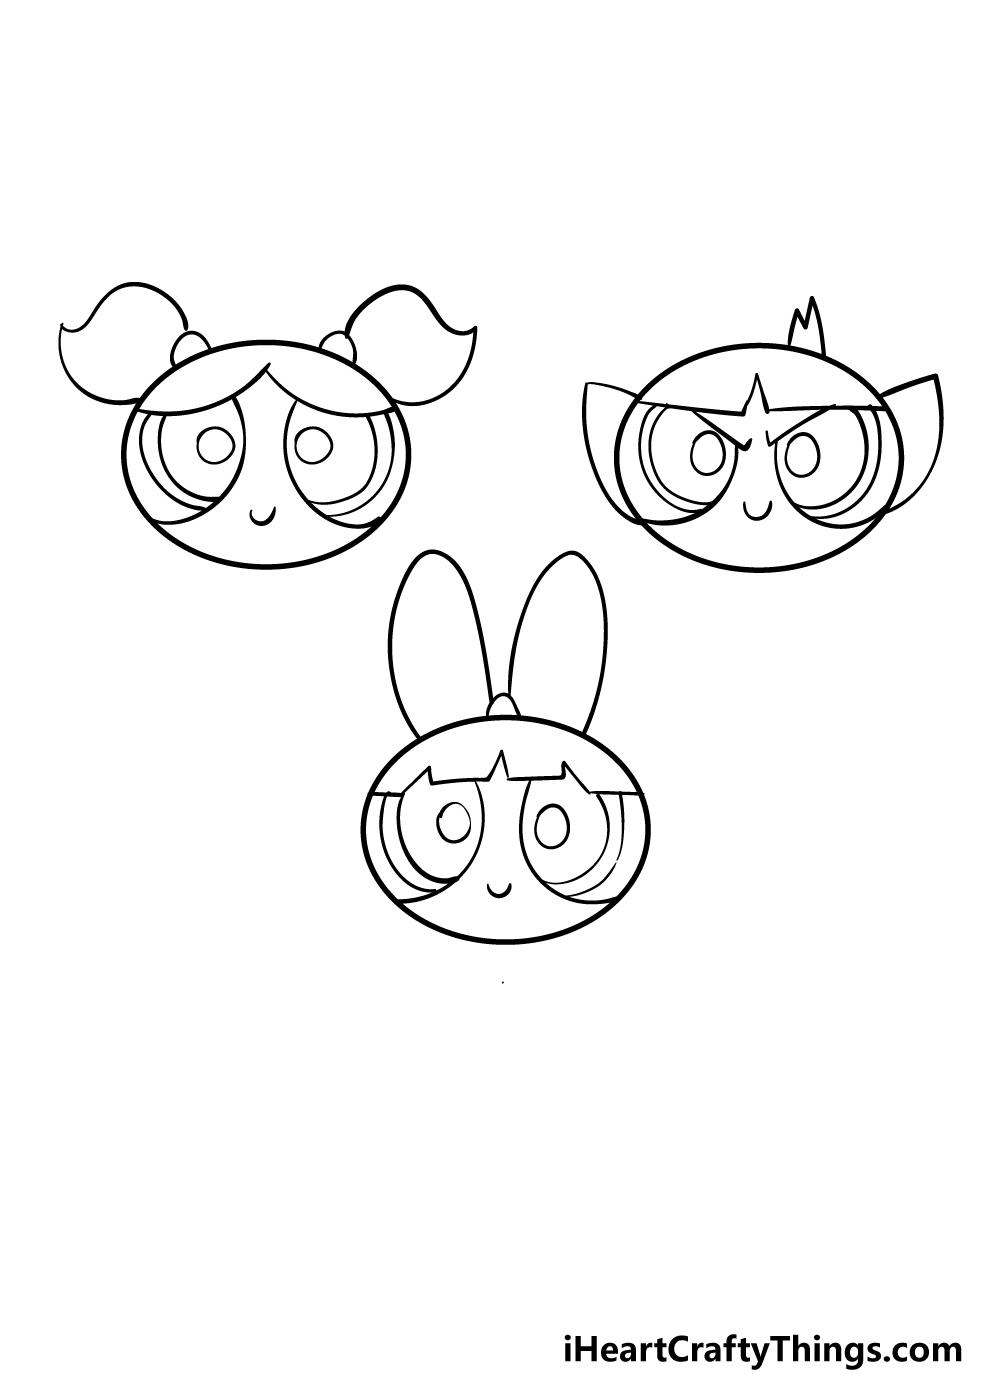 powerpuff girls drawing step 4